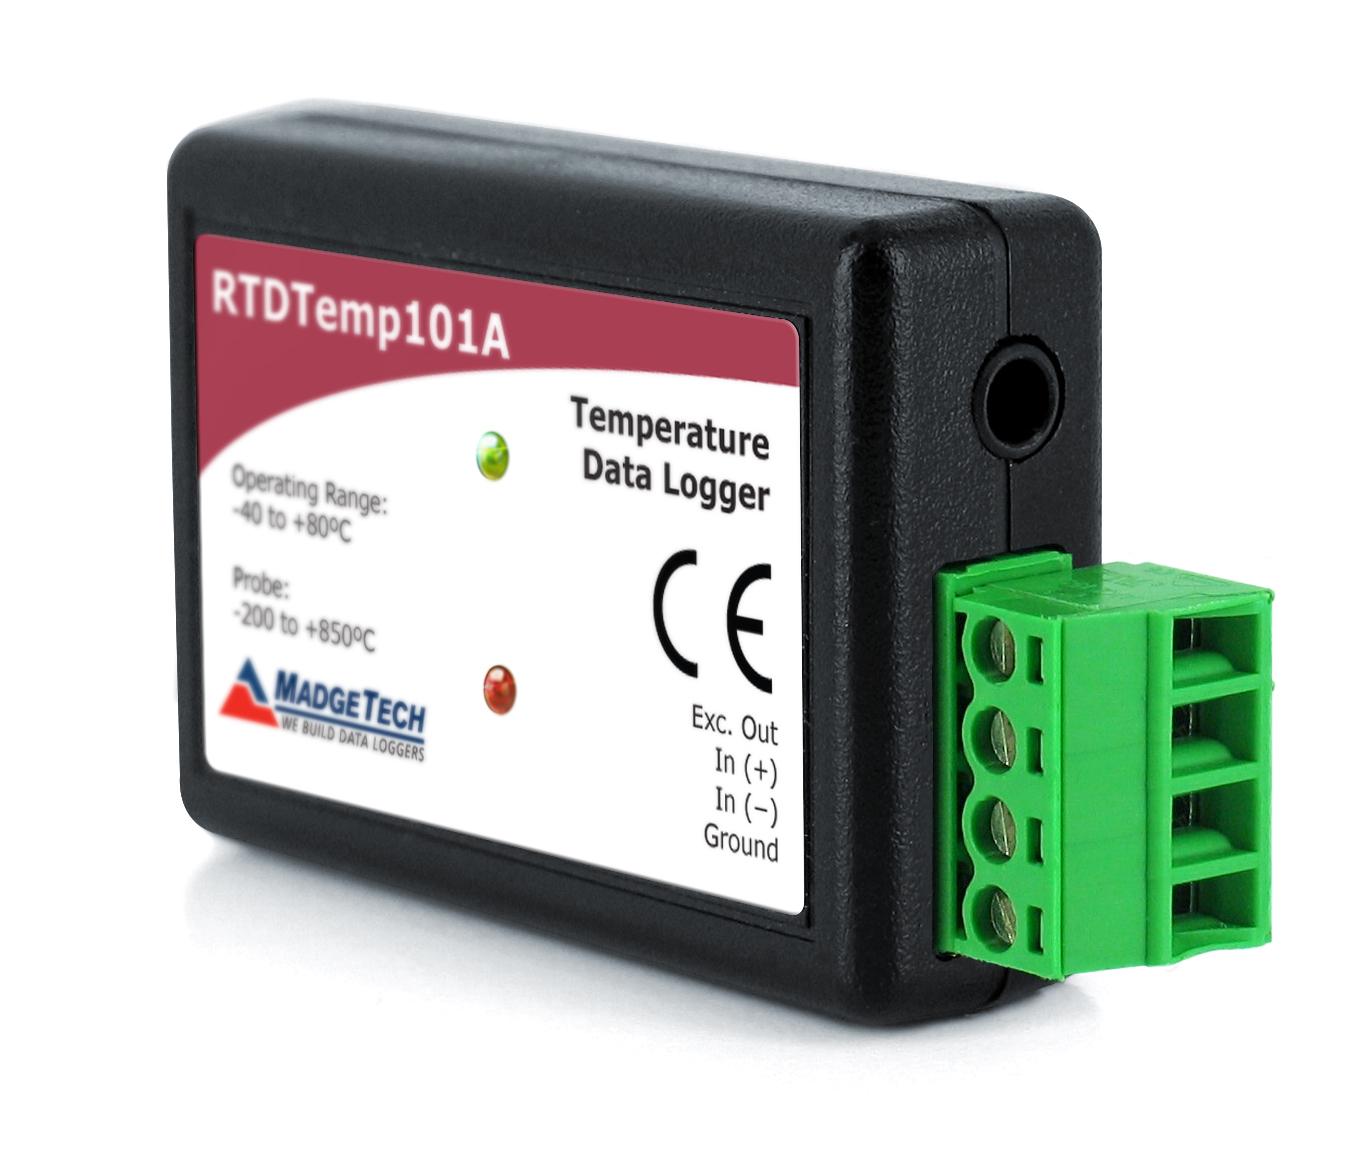 RTDTemp101A temperature data logger